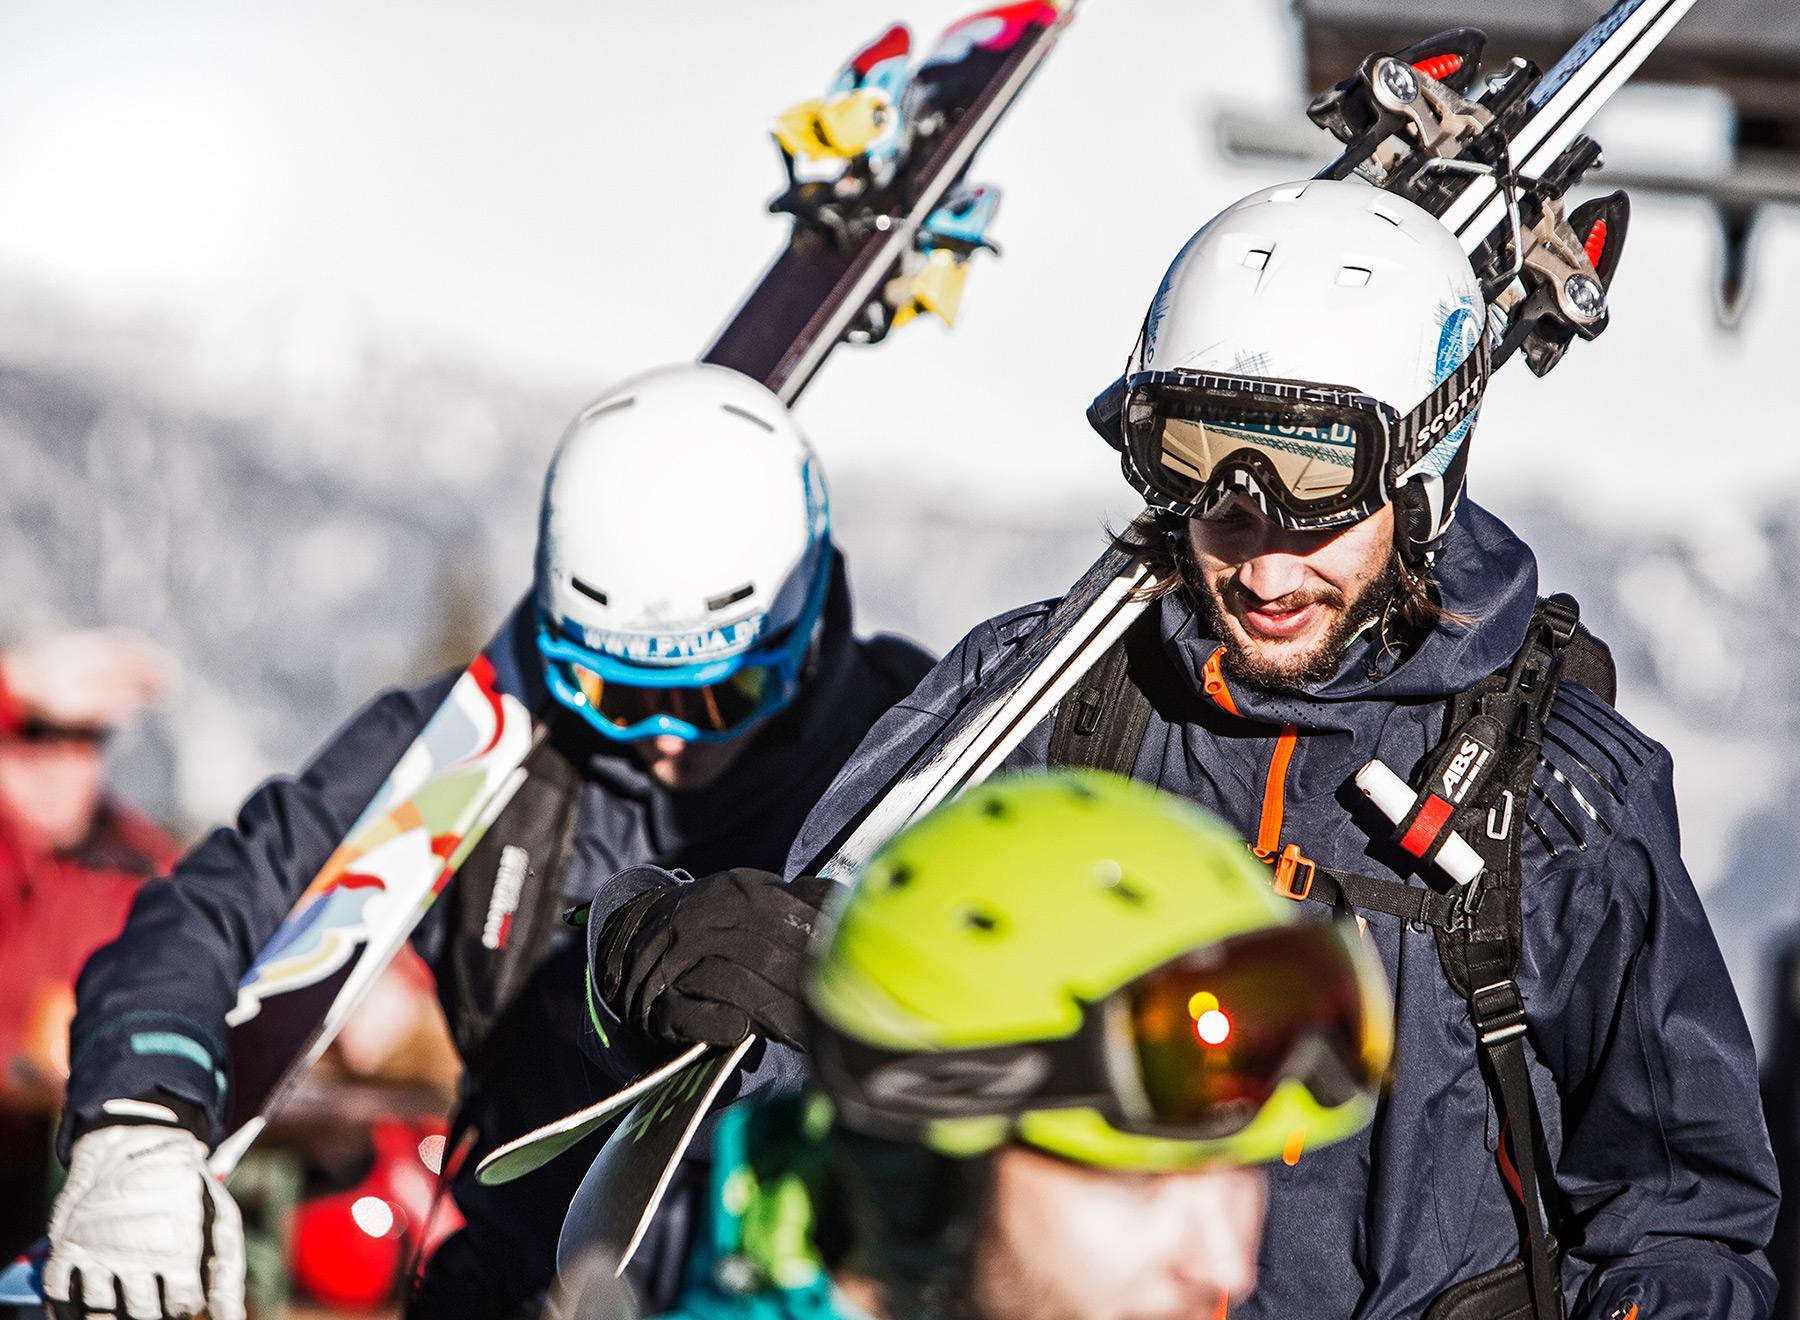 16-Pyua-Dachstein-Ski-Action-Christoph-Gramann